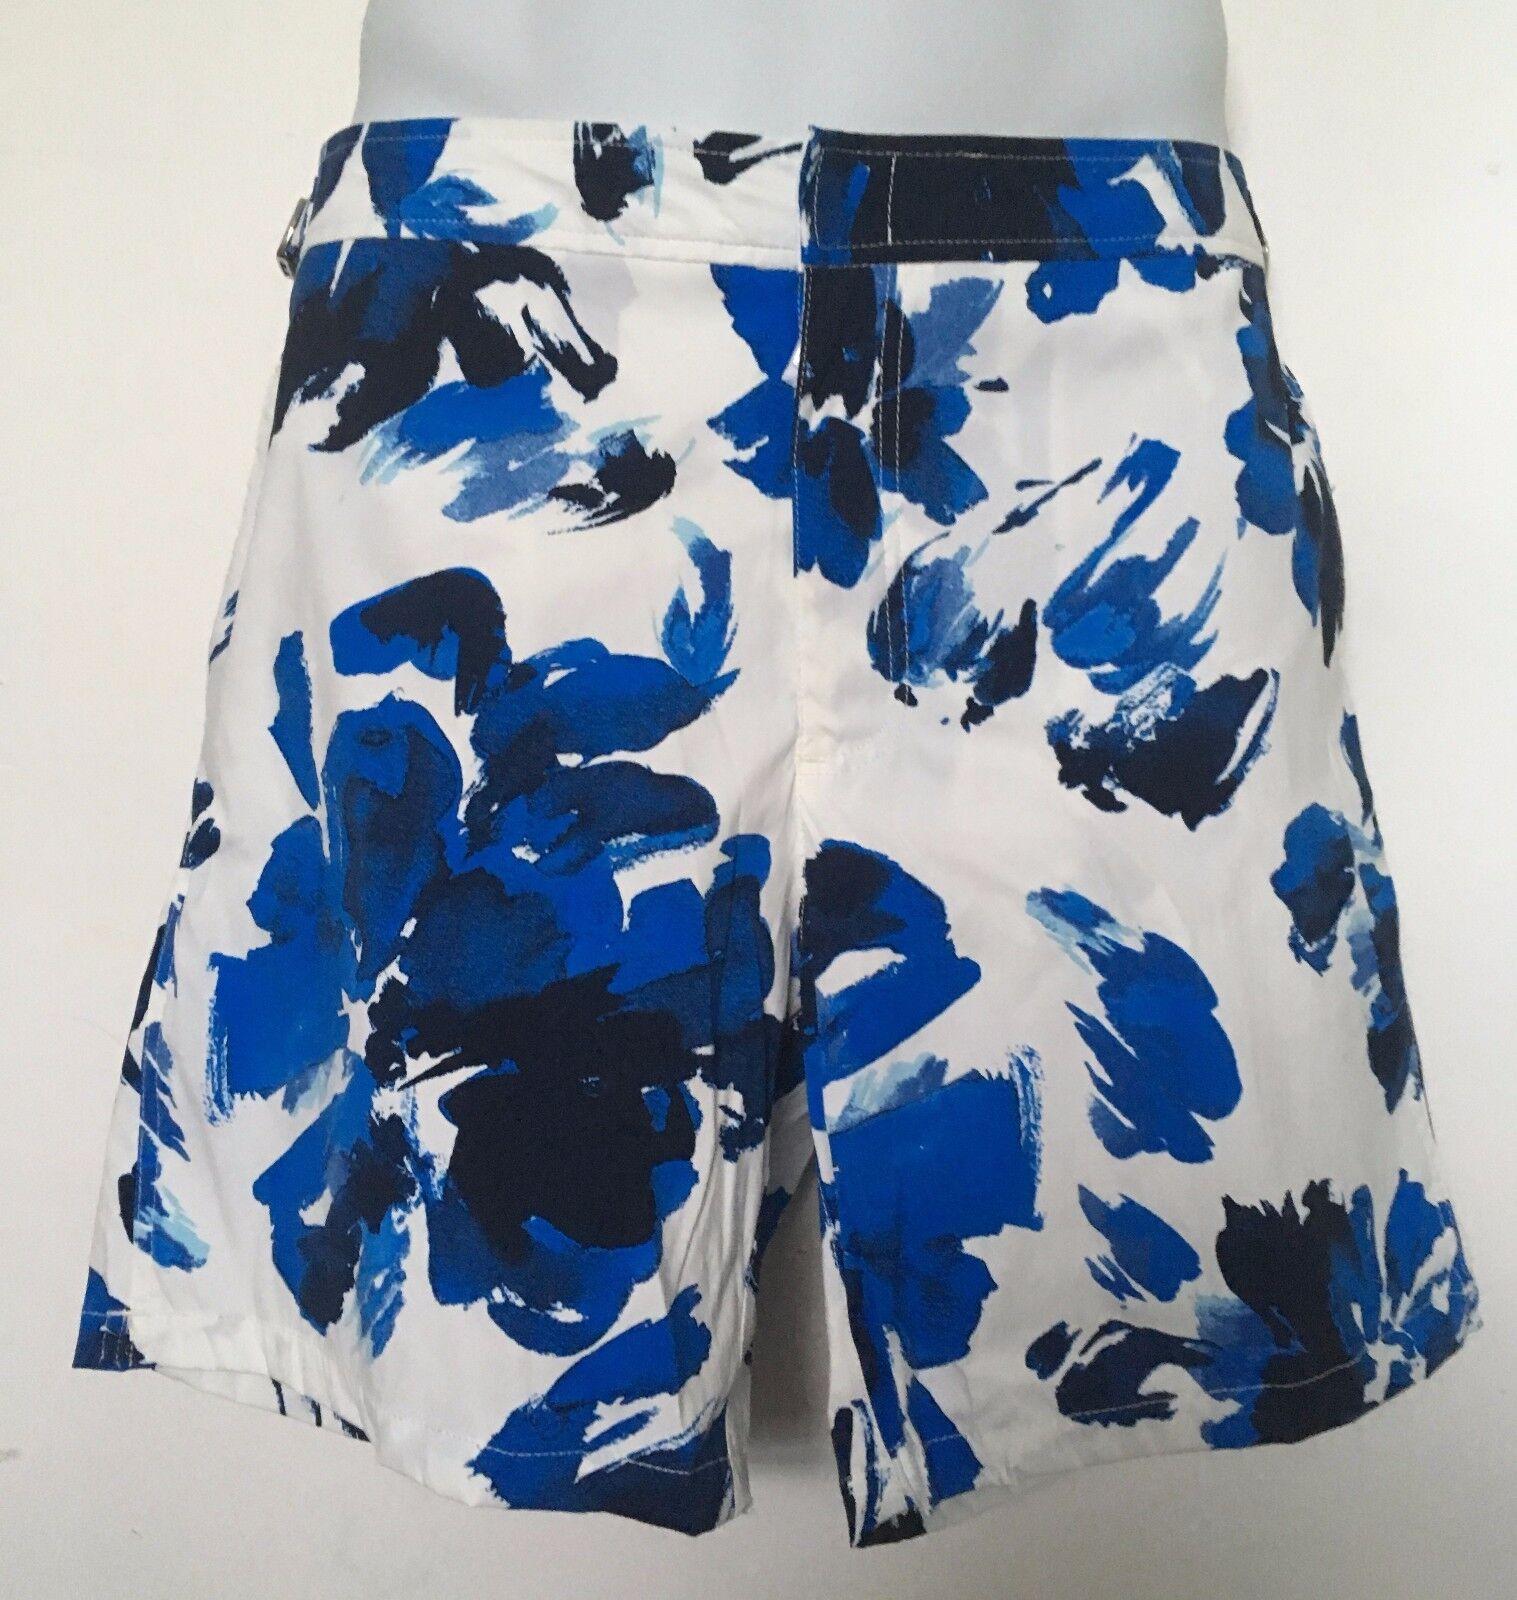 Ralph Lauren Polo Men's Swim Trunksbluee White WatercolorAdjustable 34 NWT